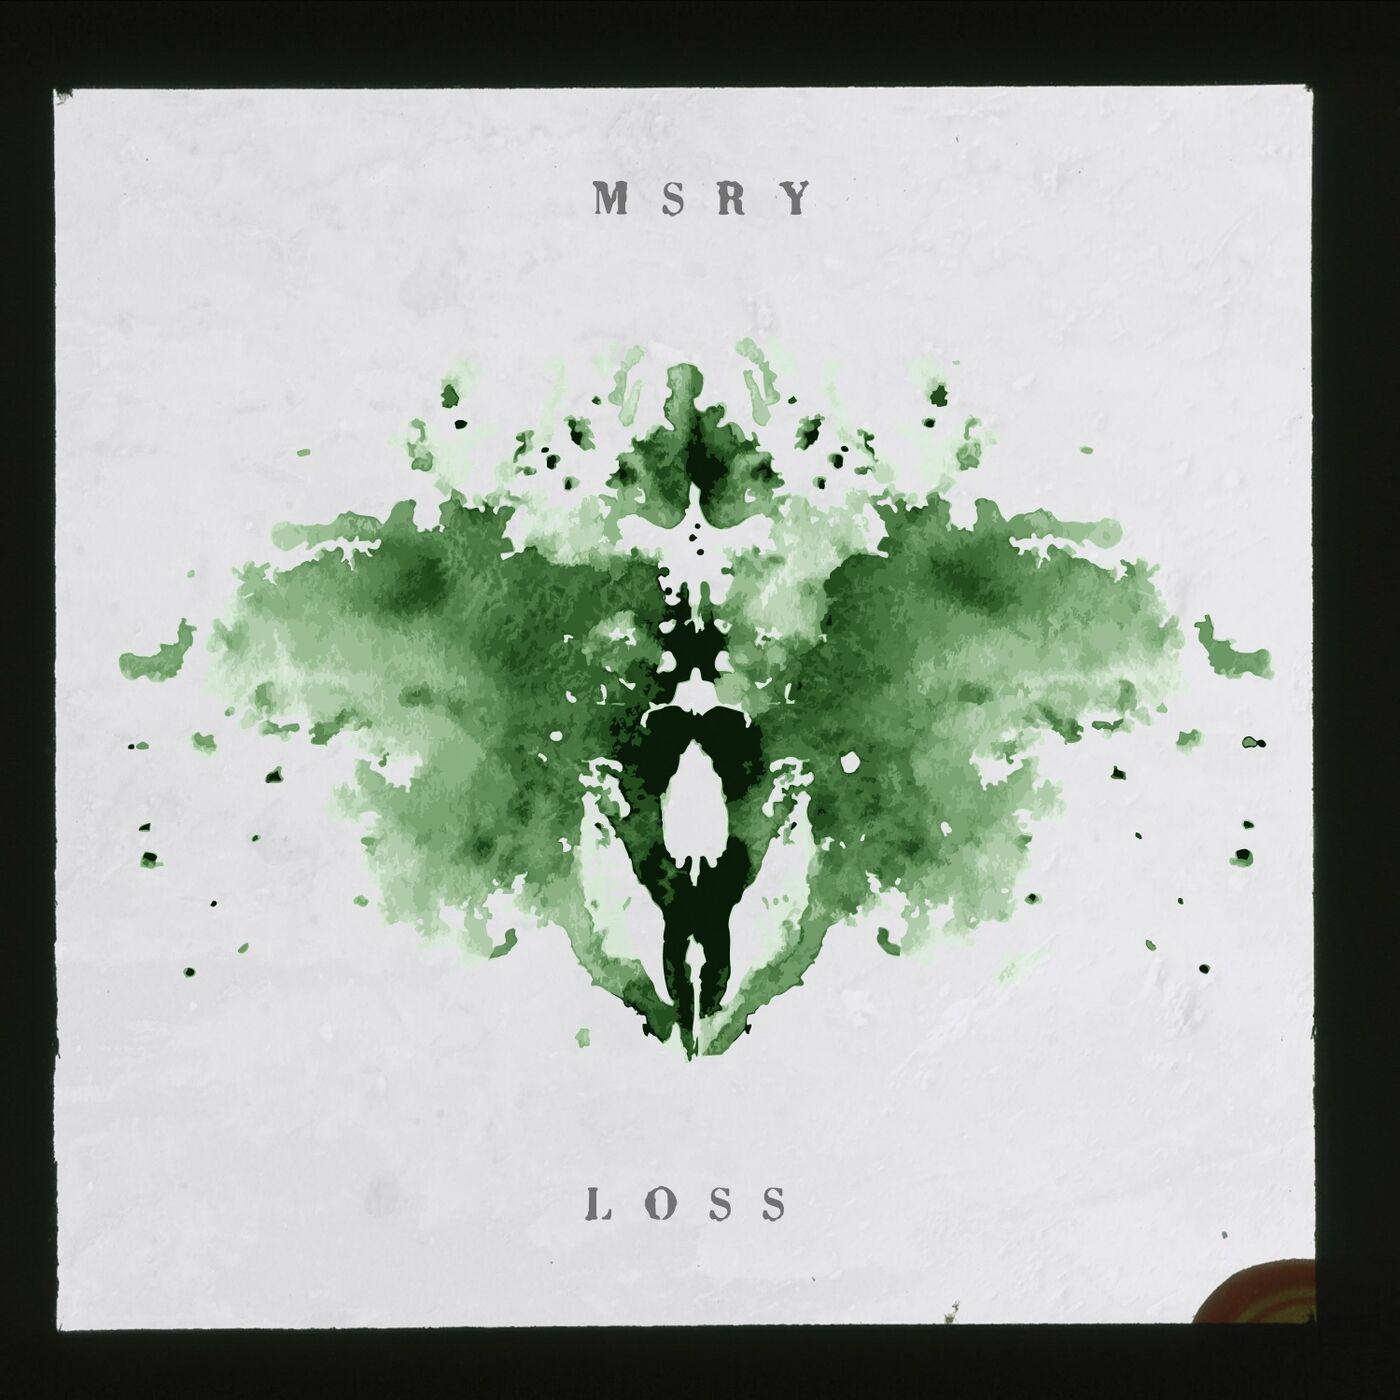 MSRY - Loss [EP] (2019)